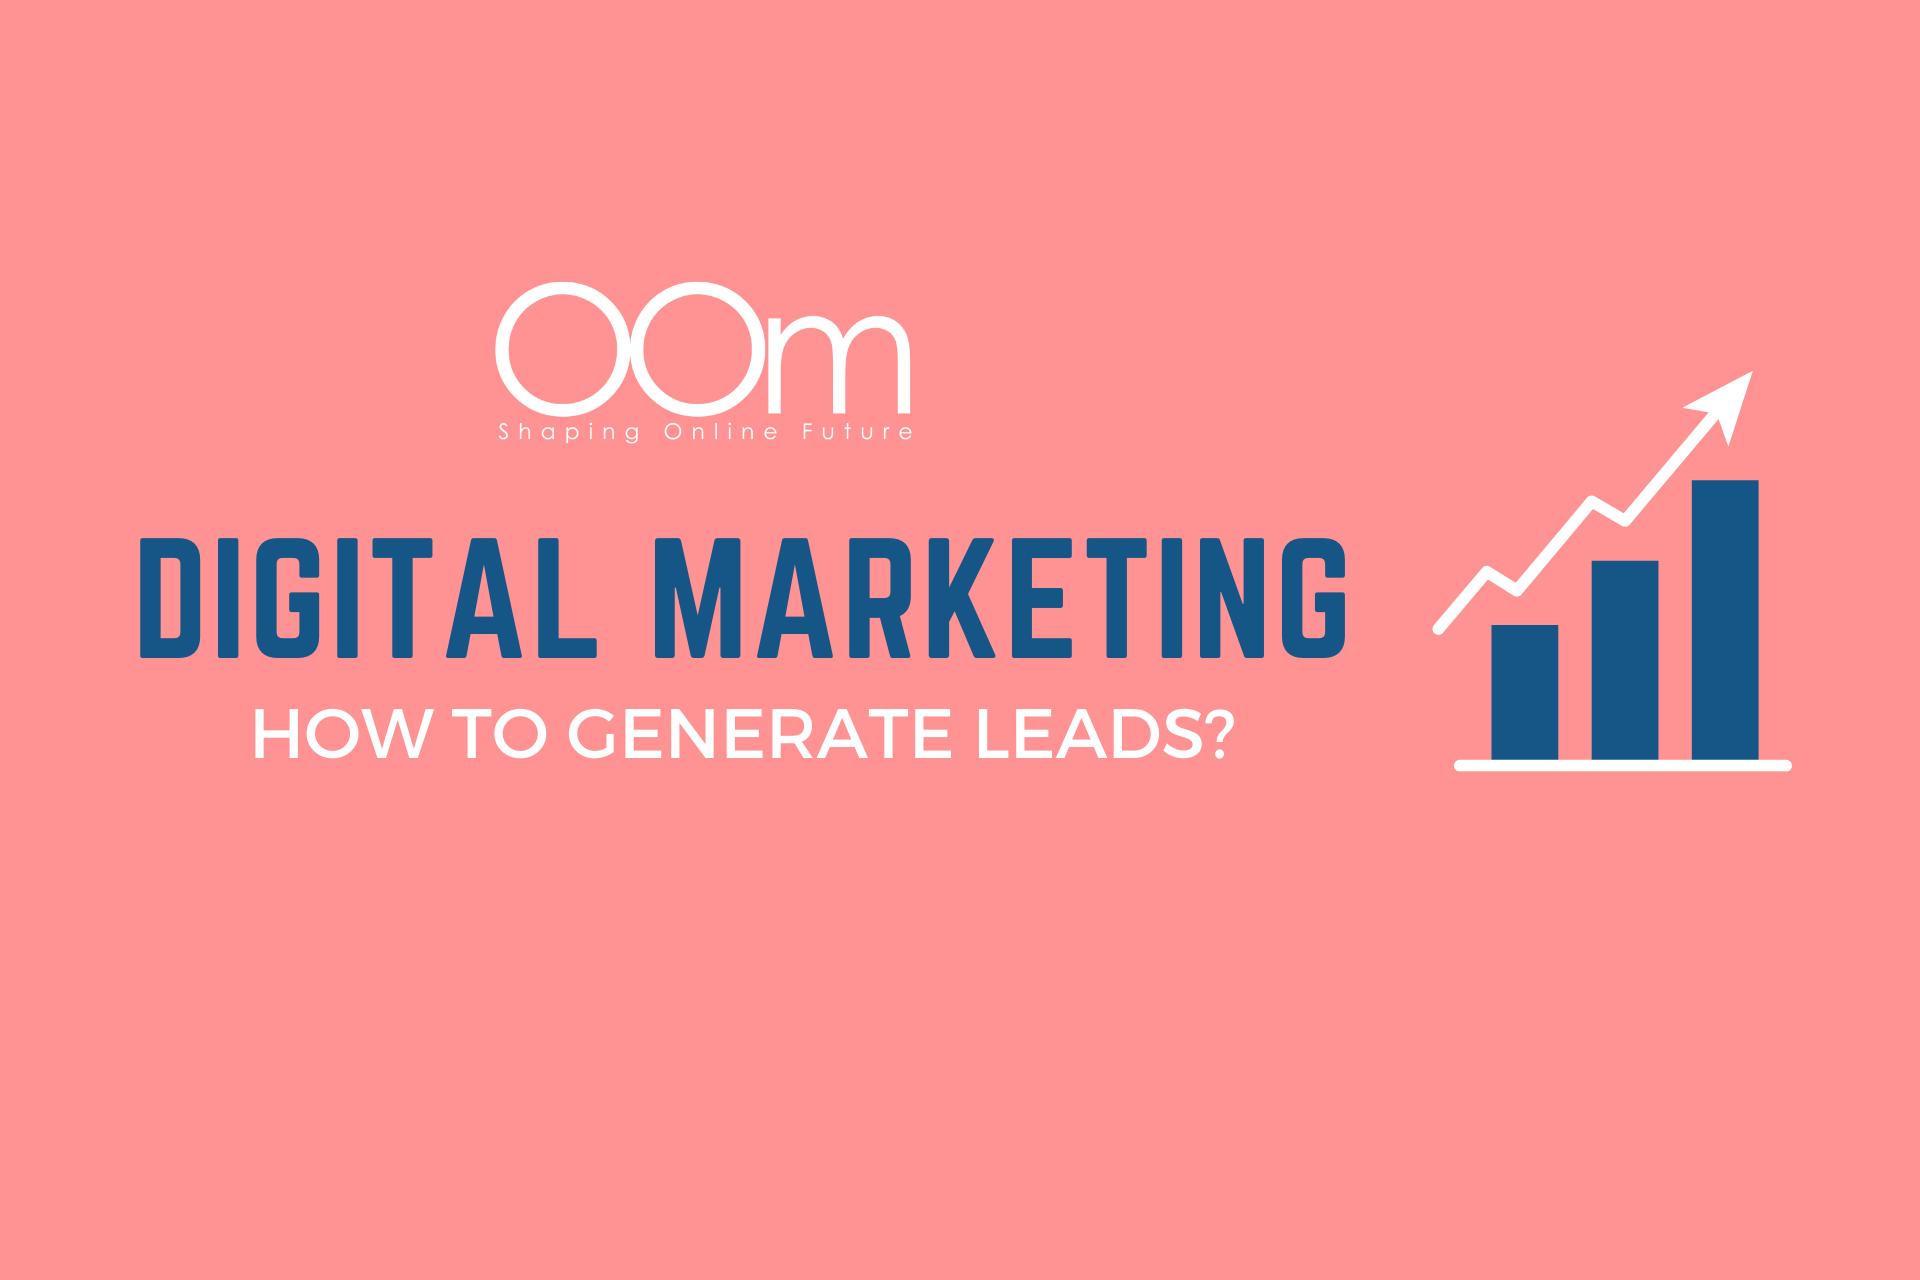 Digital Marketing Strategies For Generating Leads